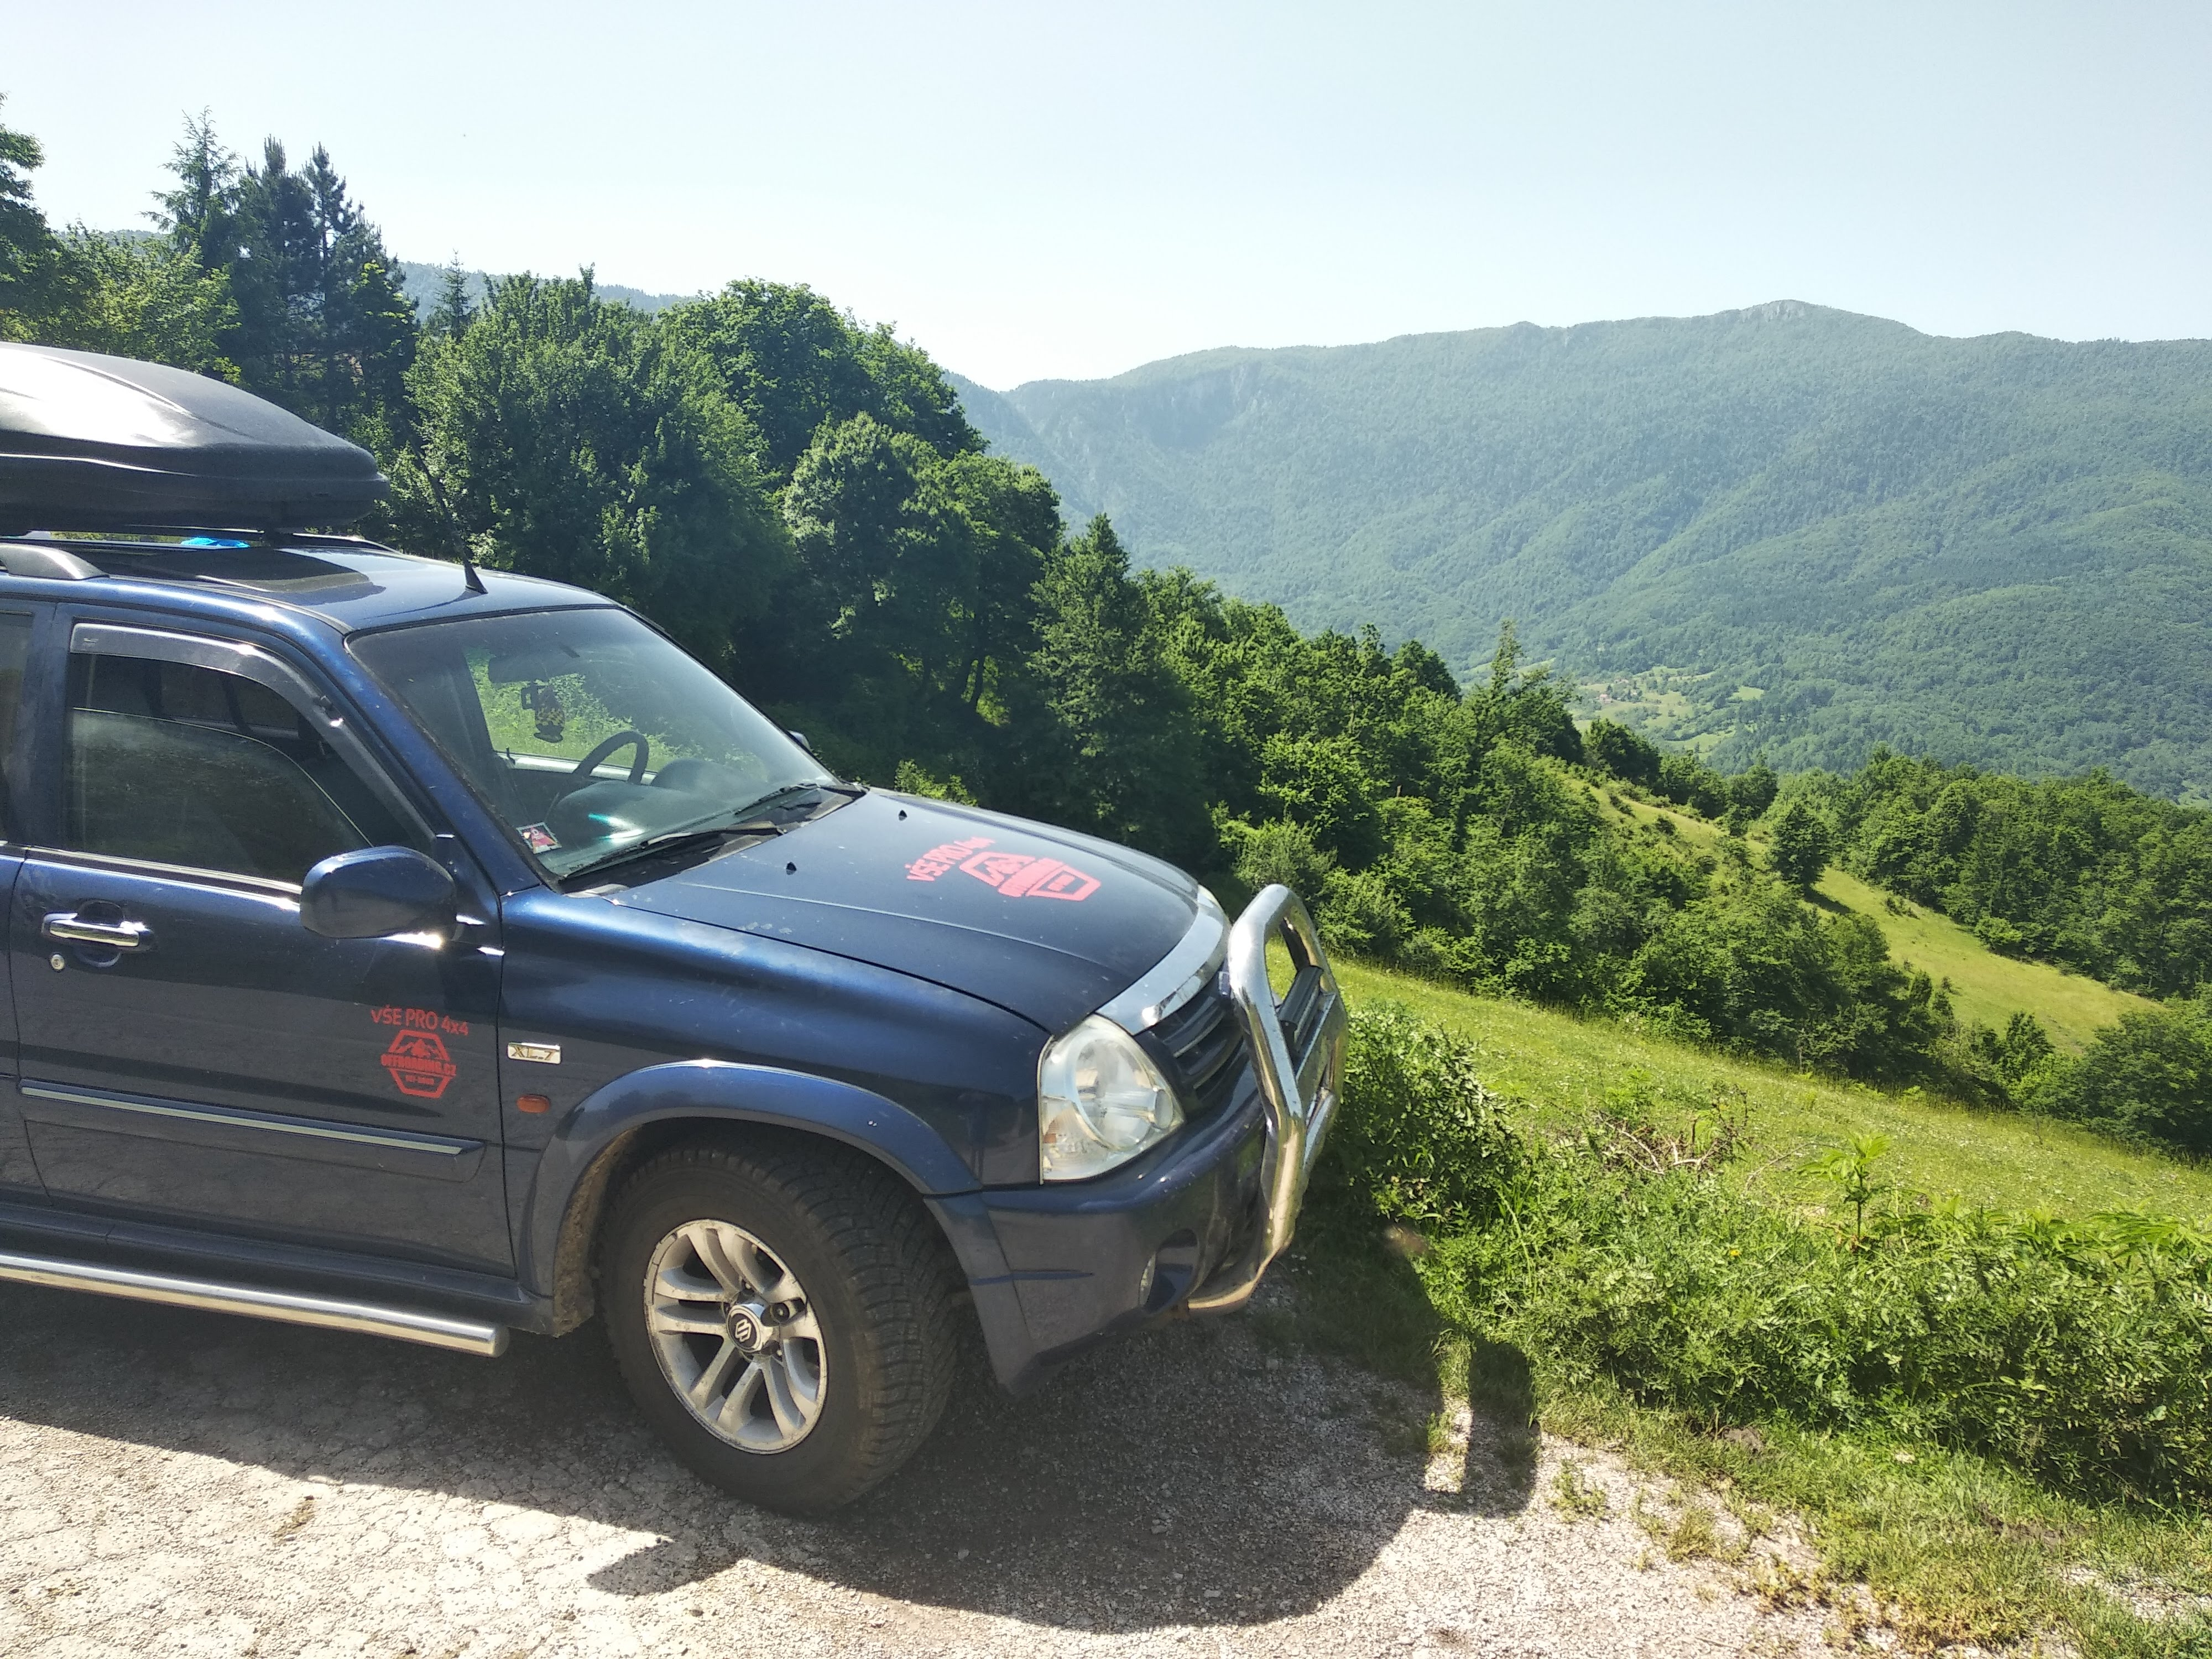 Super hrrr akce Albanie, Černá Hora, Bosna